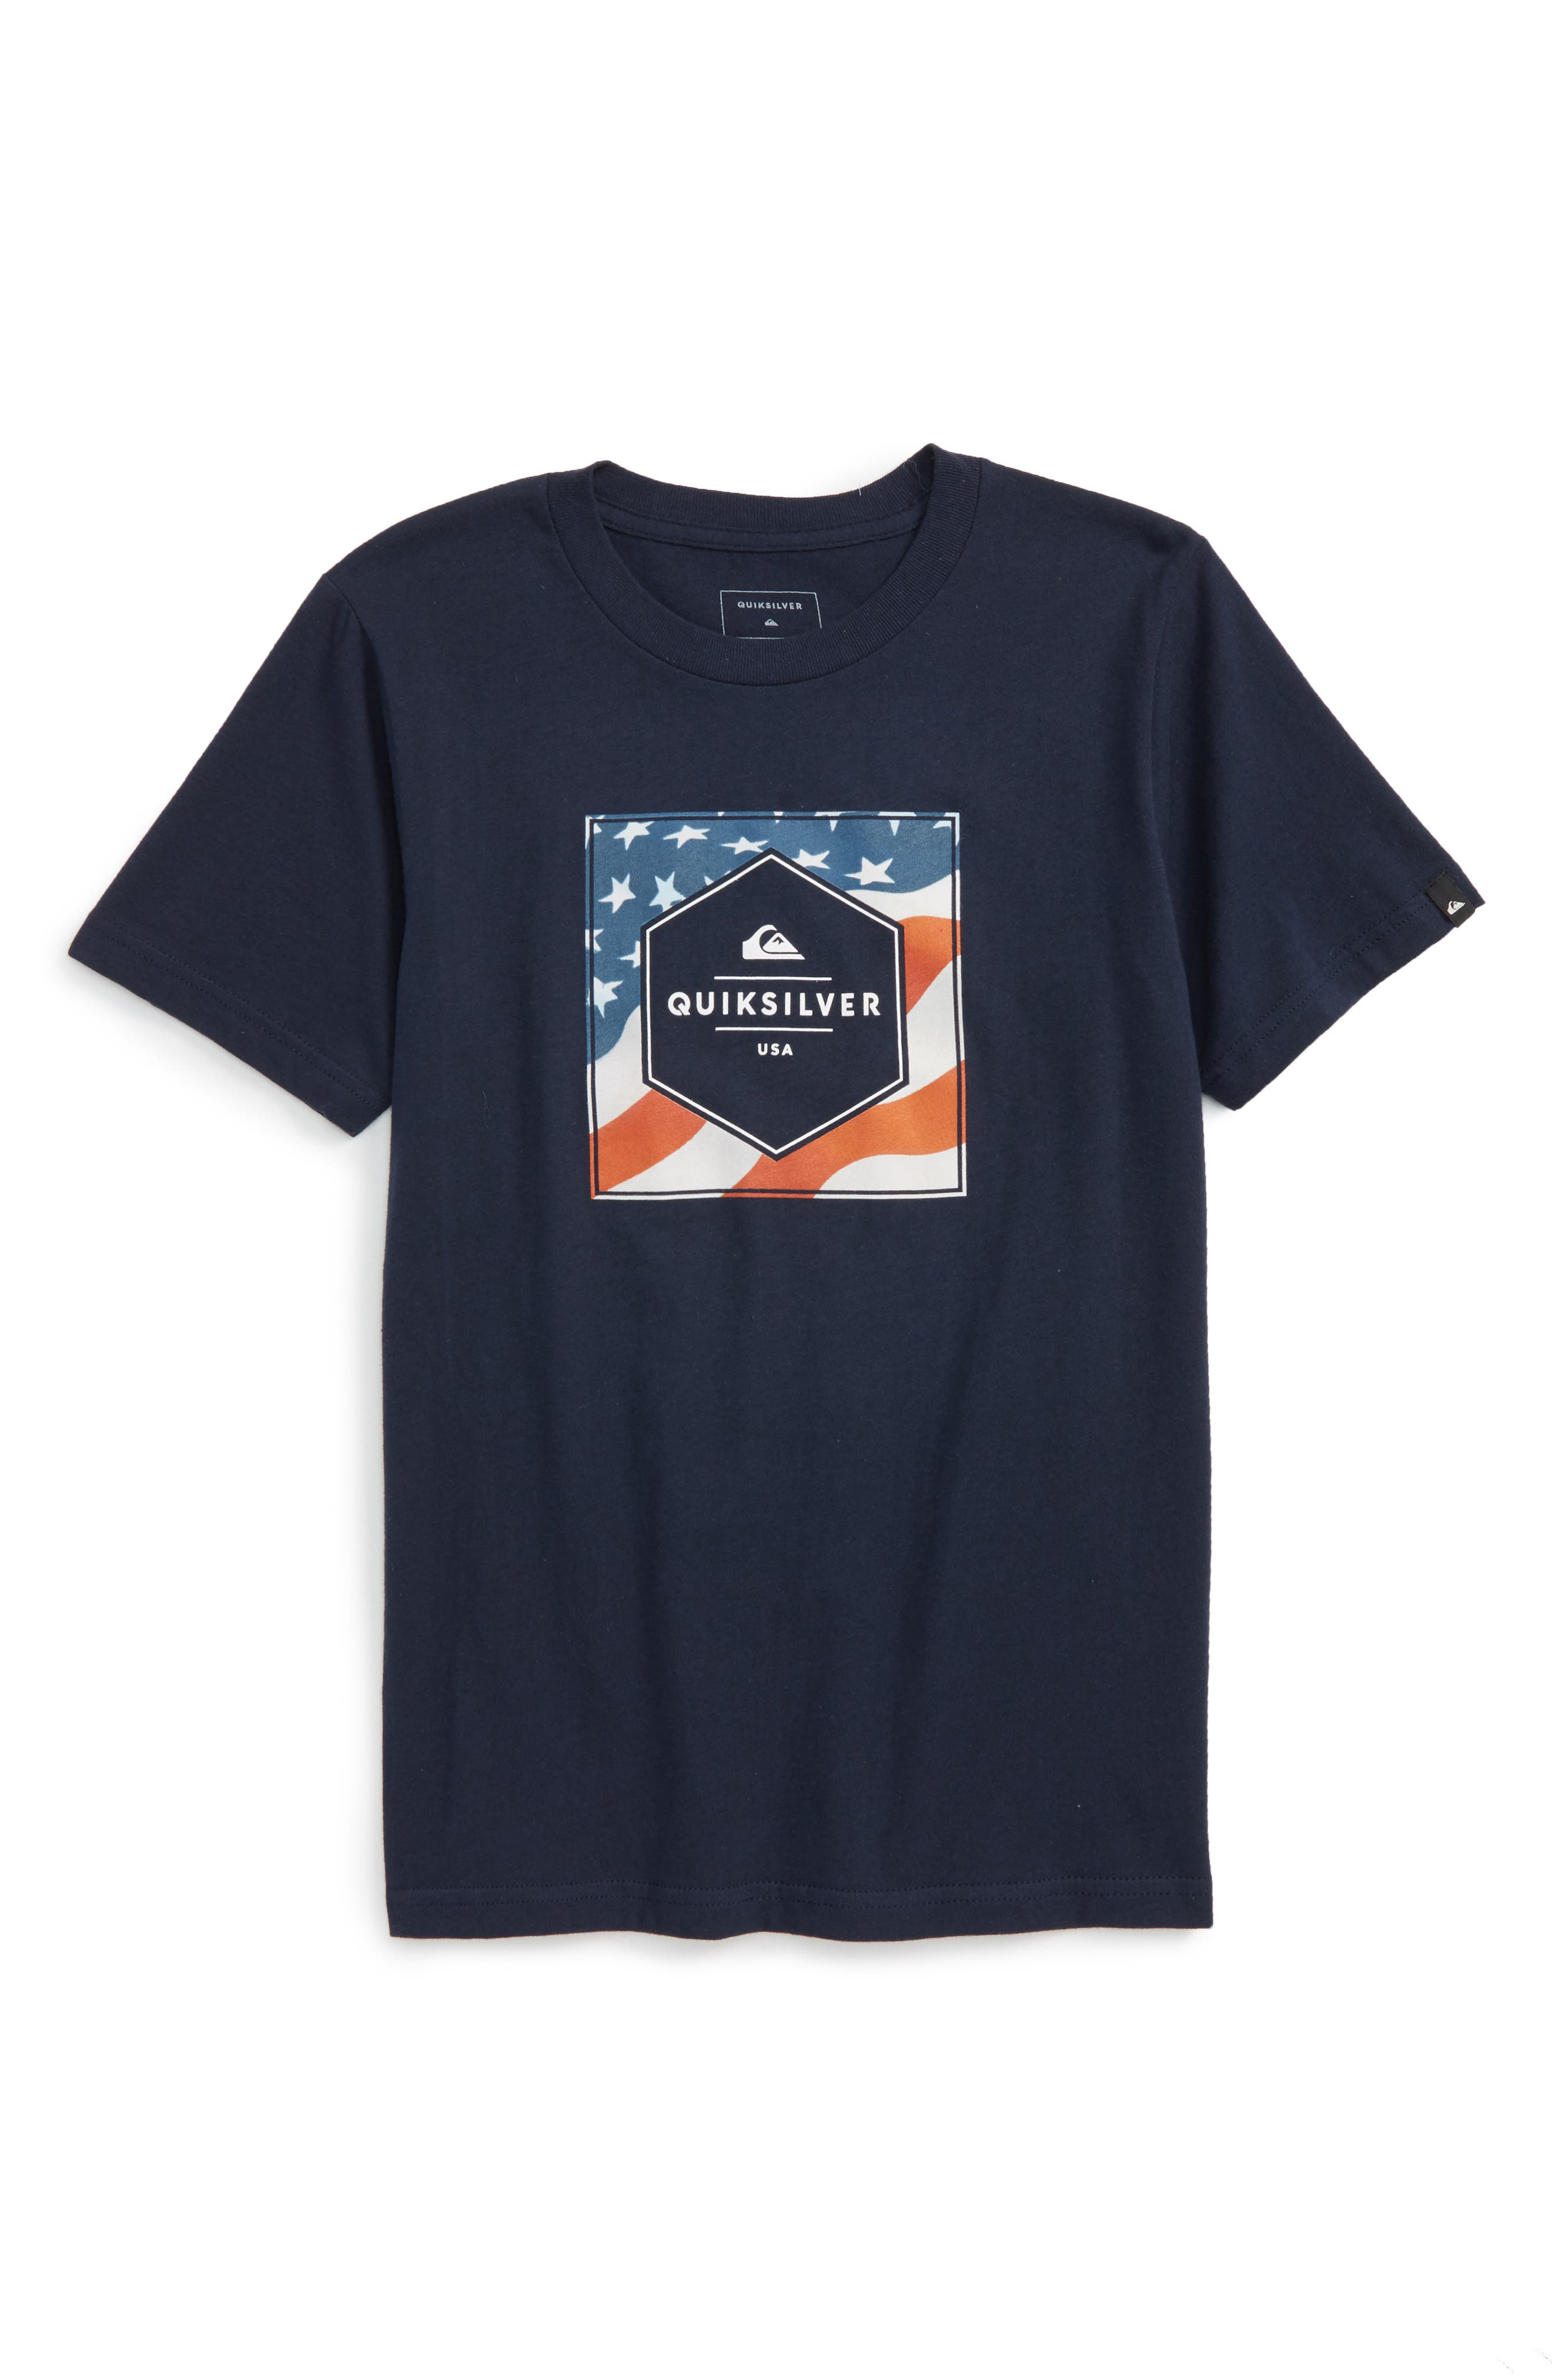 Quiksilver Stars N Stripes Graphic T-Shirt (Big Boys)